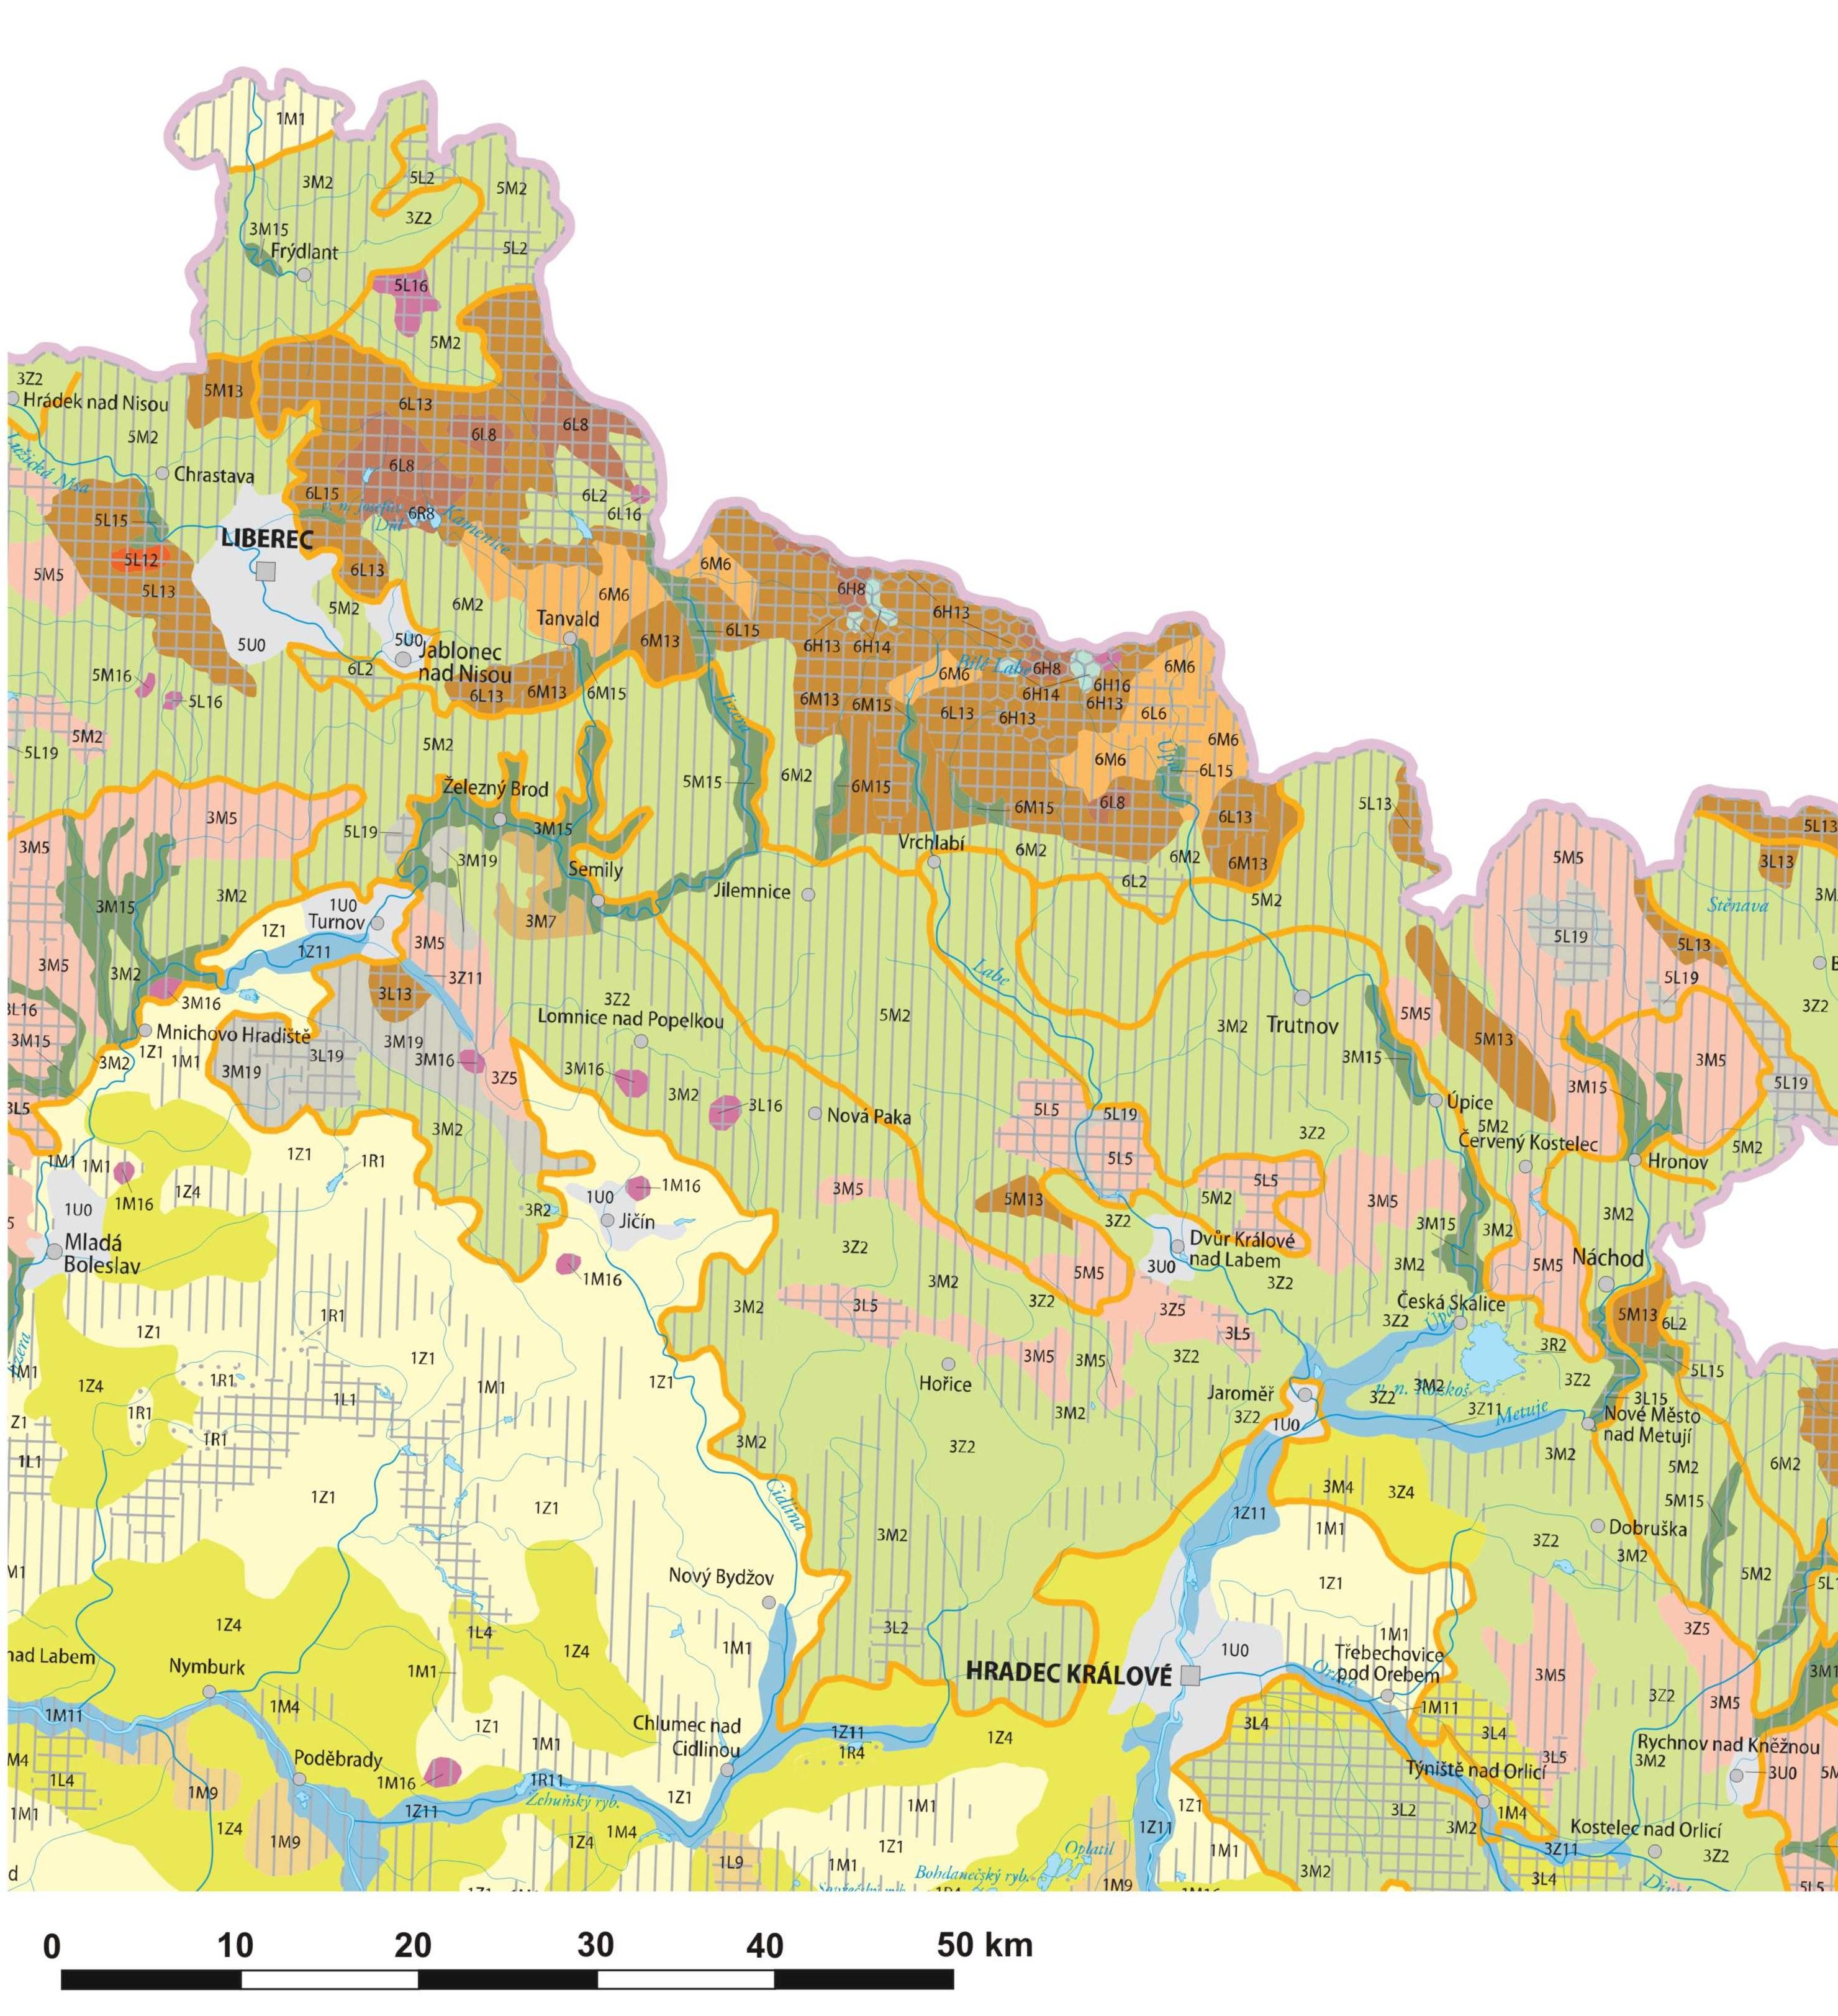 Ryc. 1. Mapa charakteru krajobrazu Republiki Czeskiej (północny fragment kraju) Żródło: Low J., Culek M., Hartl P, Novák J. (Hrnčiarová, Mackovčin, Zvara 2010 s. 198)